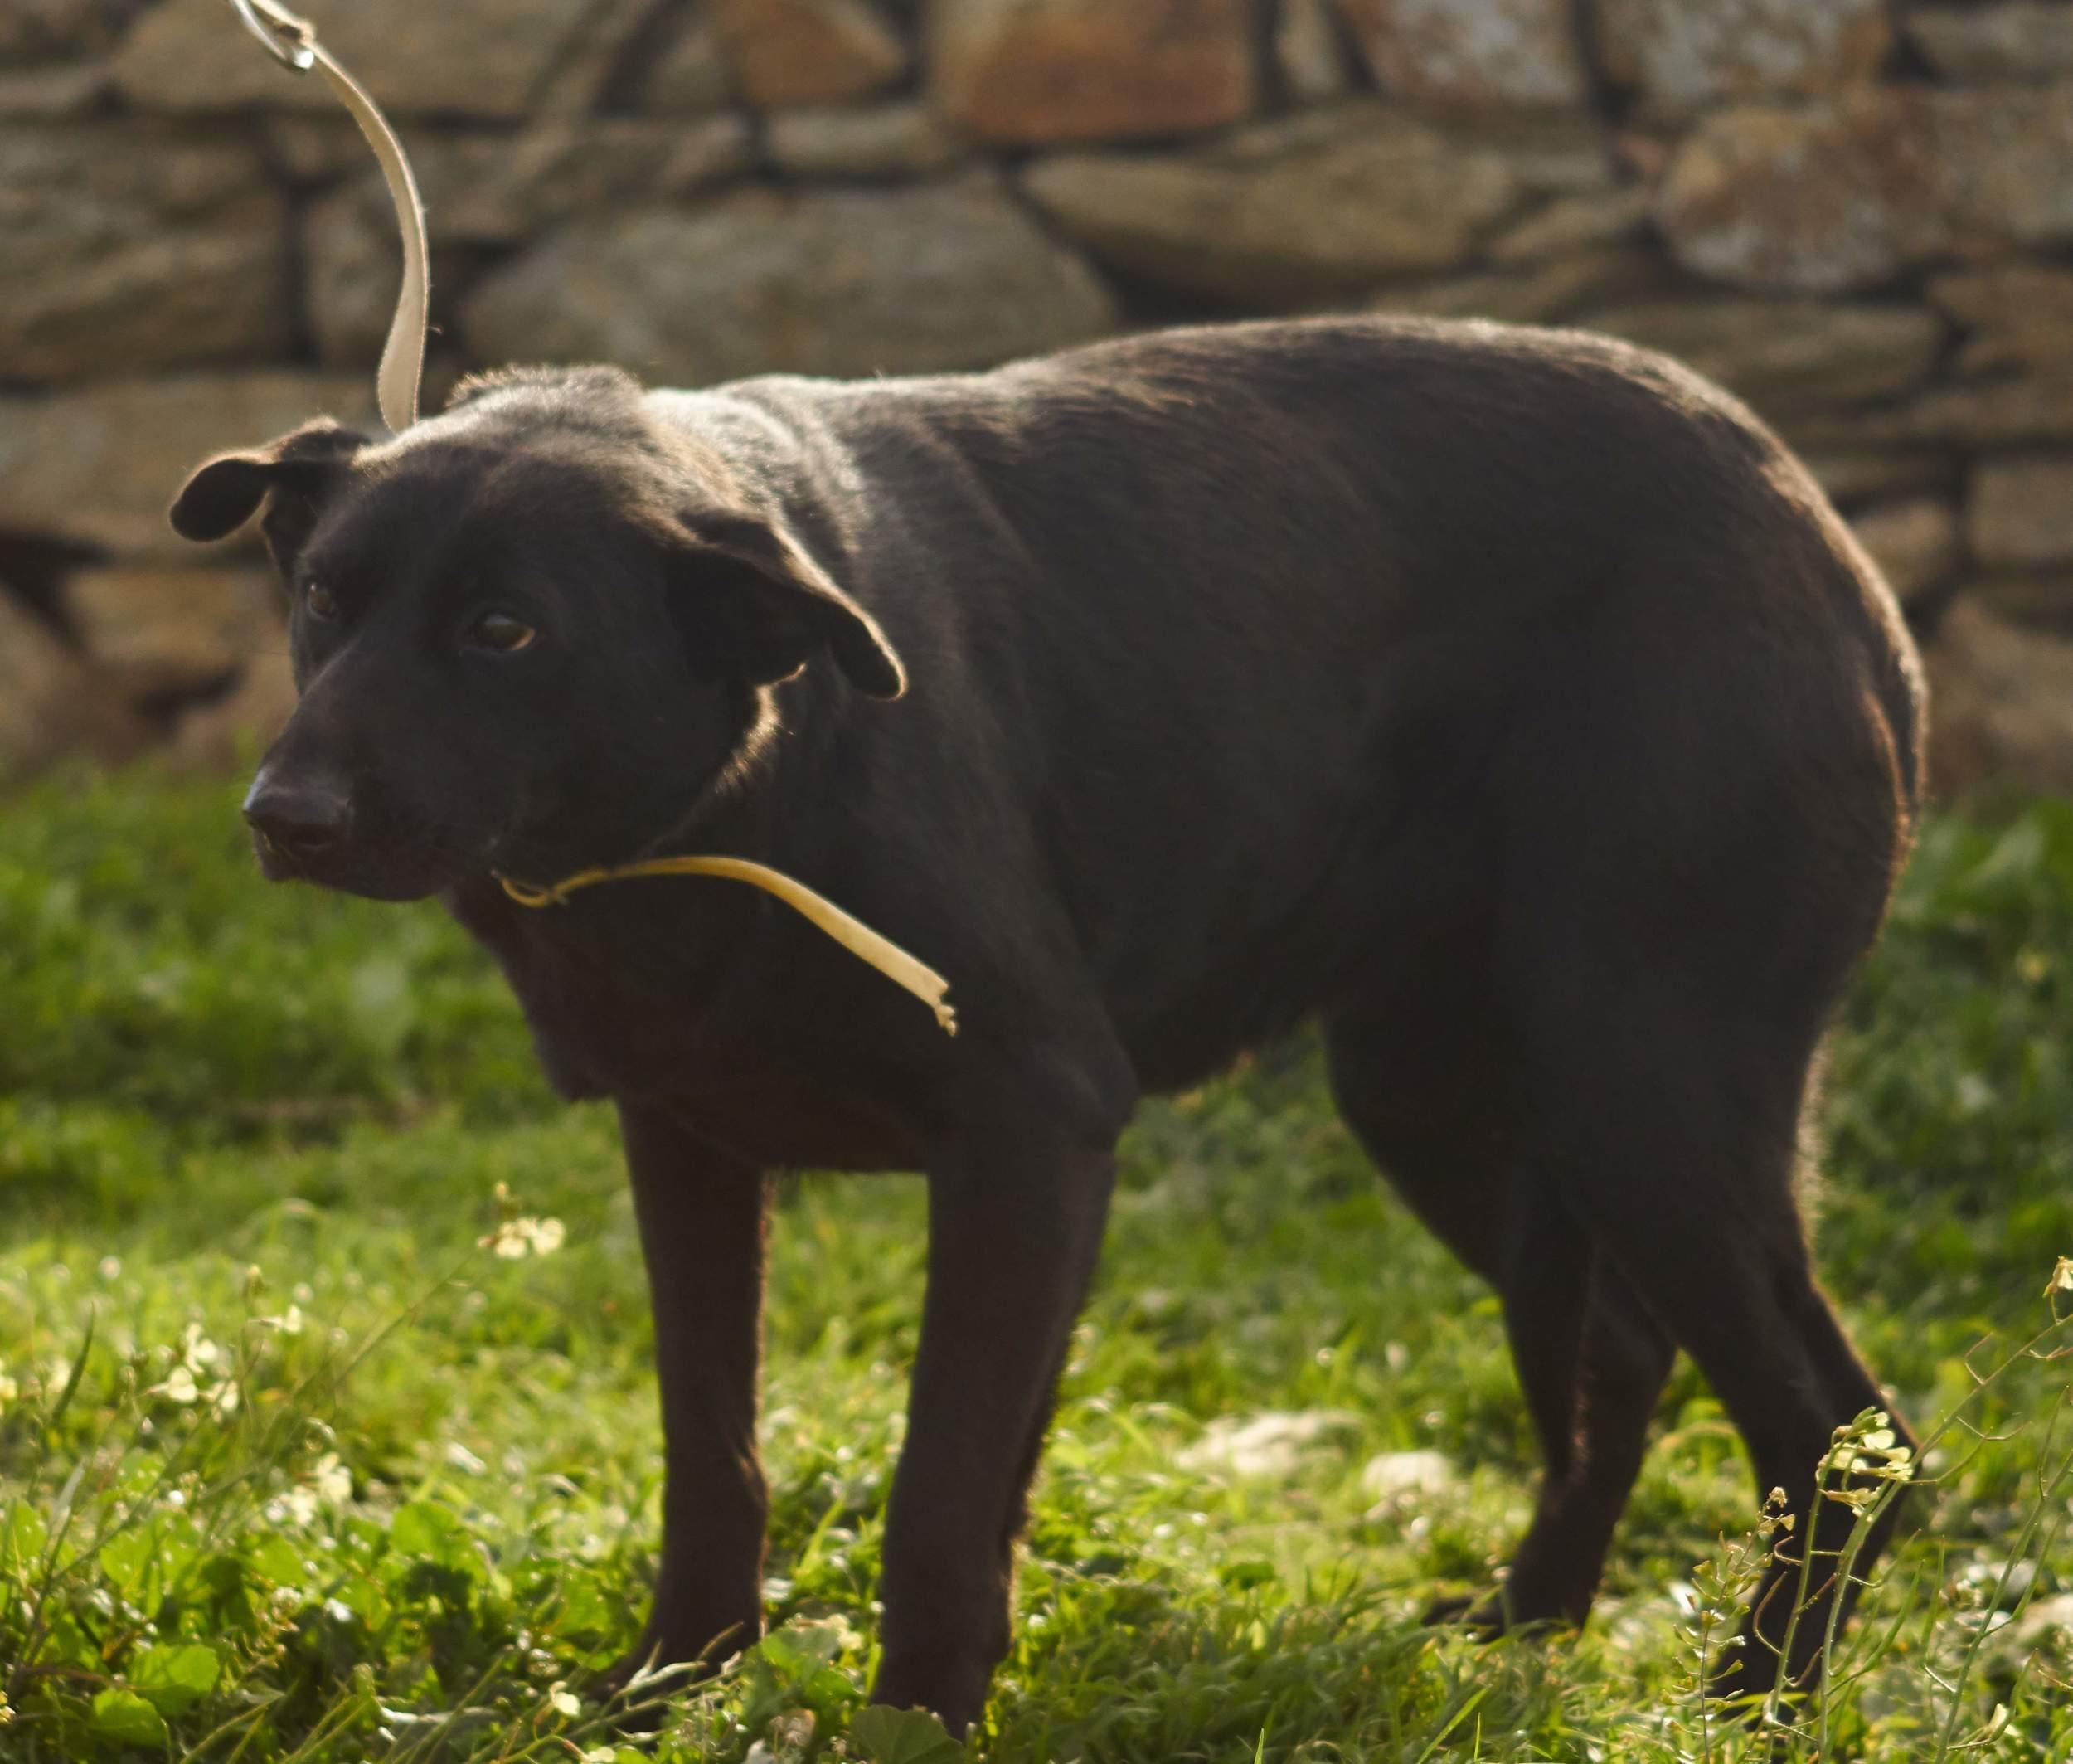 Kostoula mix | Mykonos dog rescue and adoption